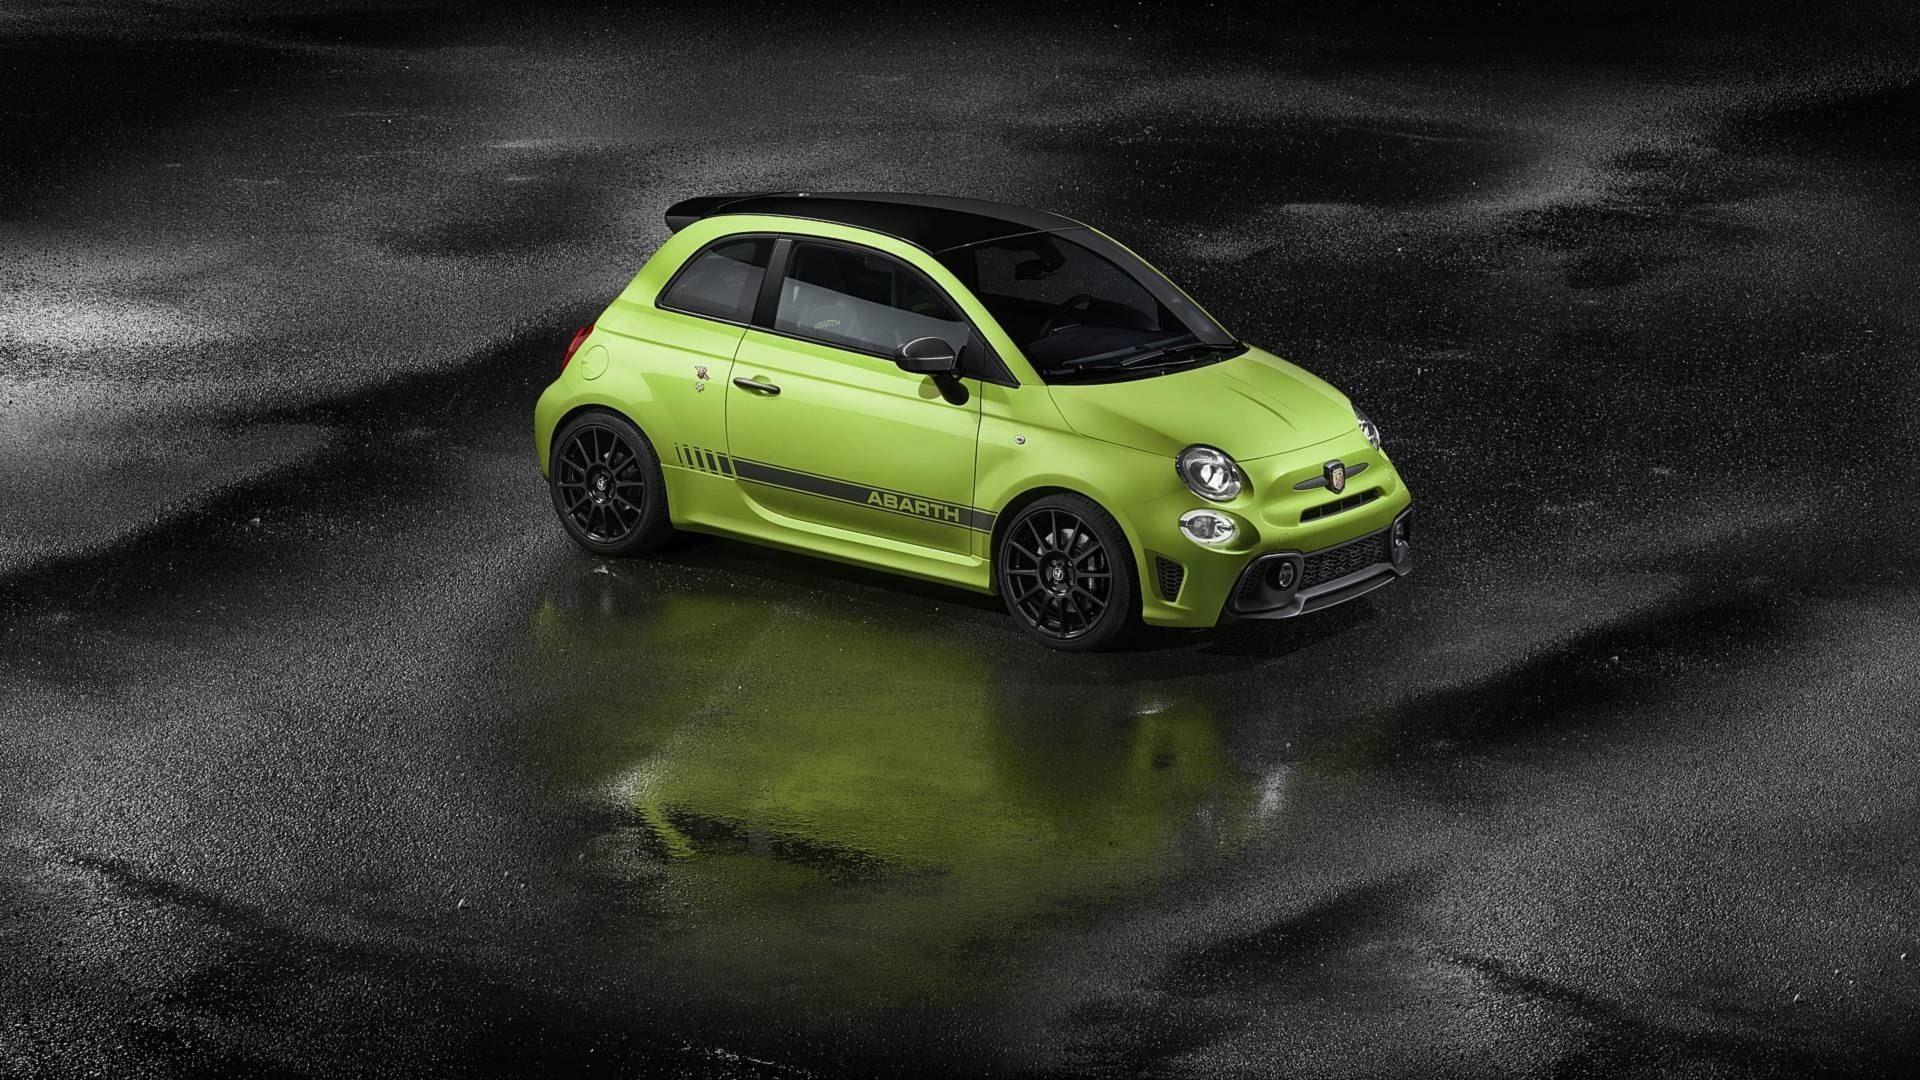 2020 Fiat 500 Abarth Features Dengan Gambar